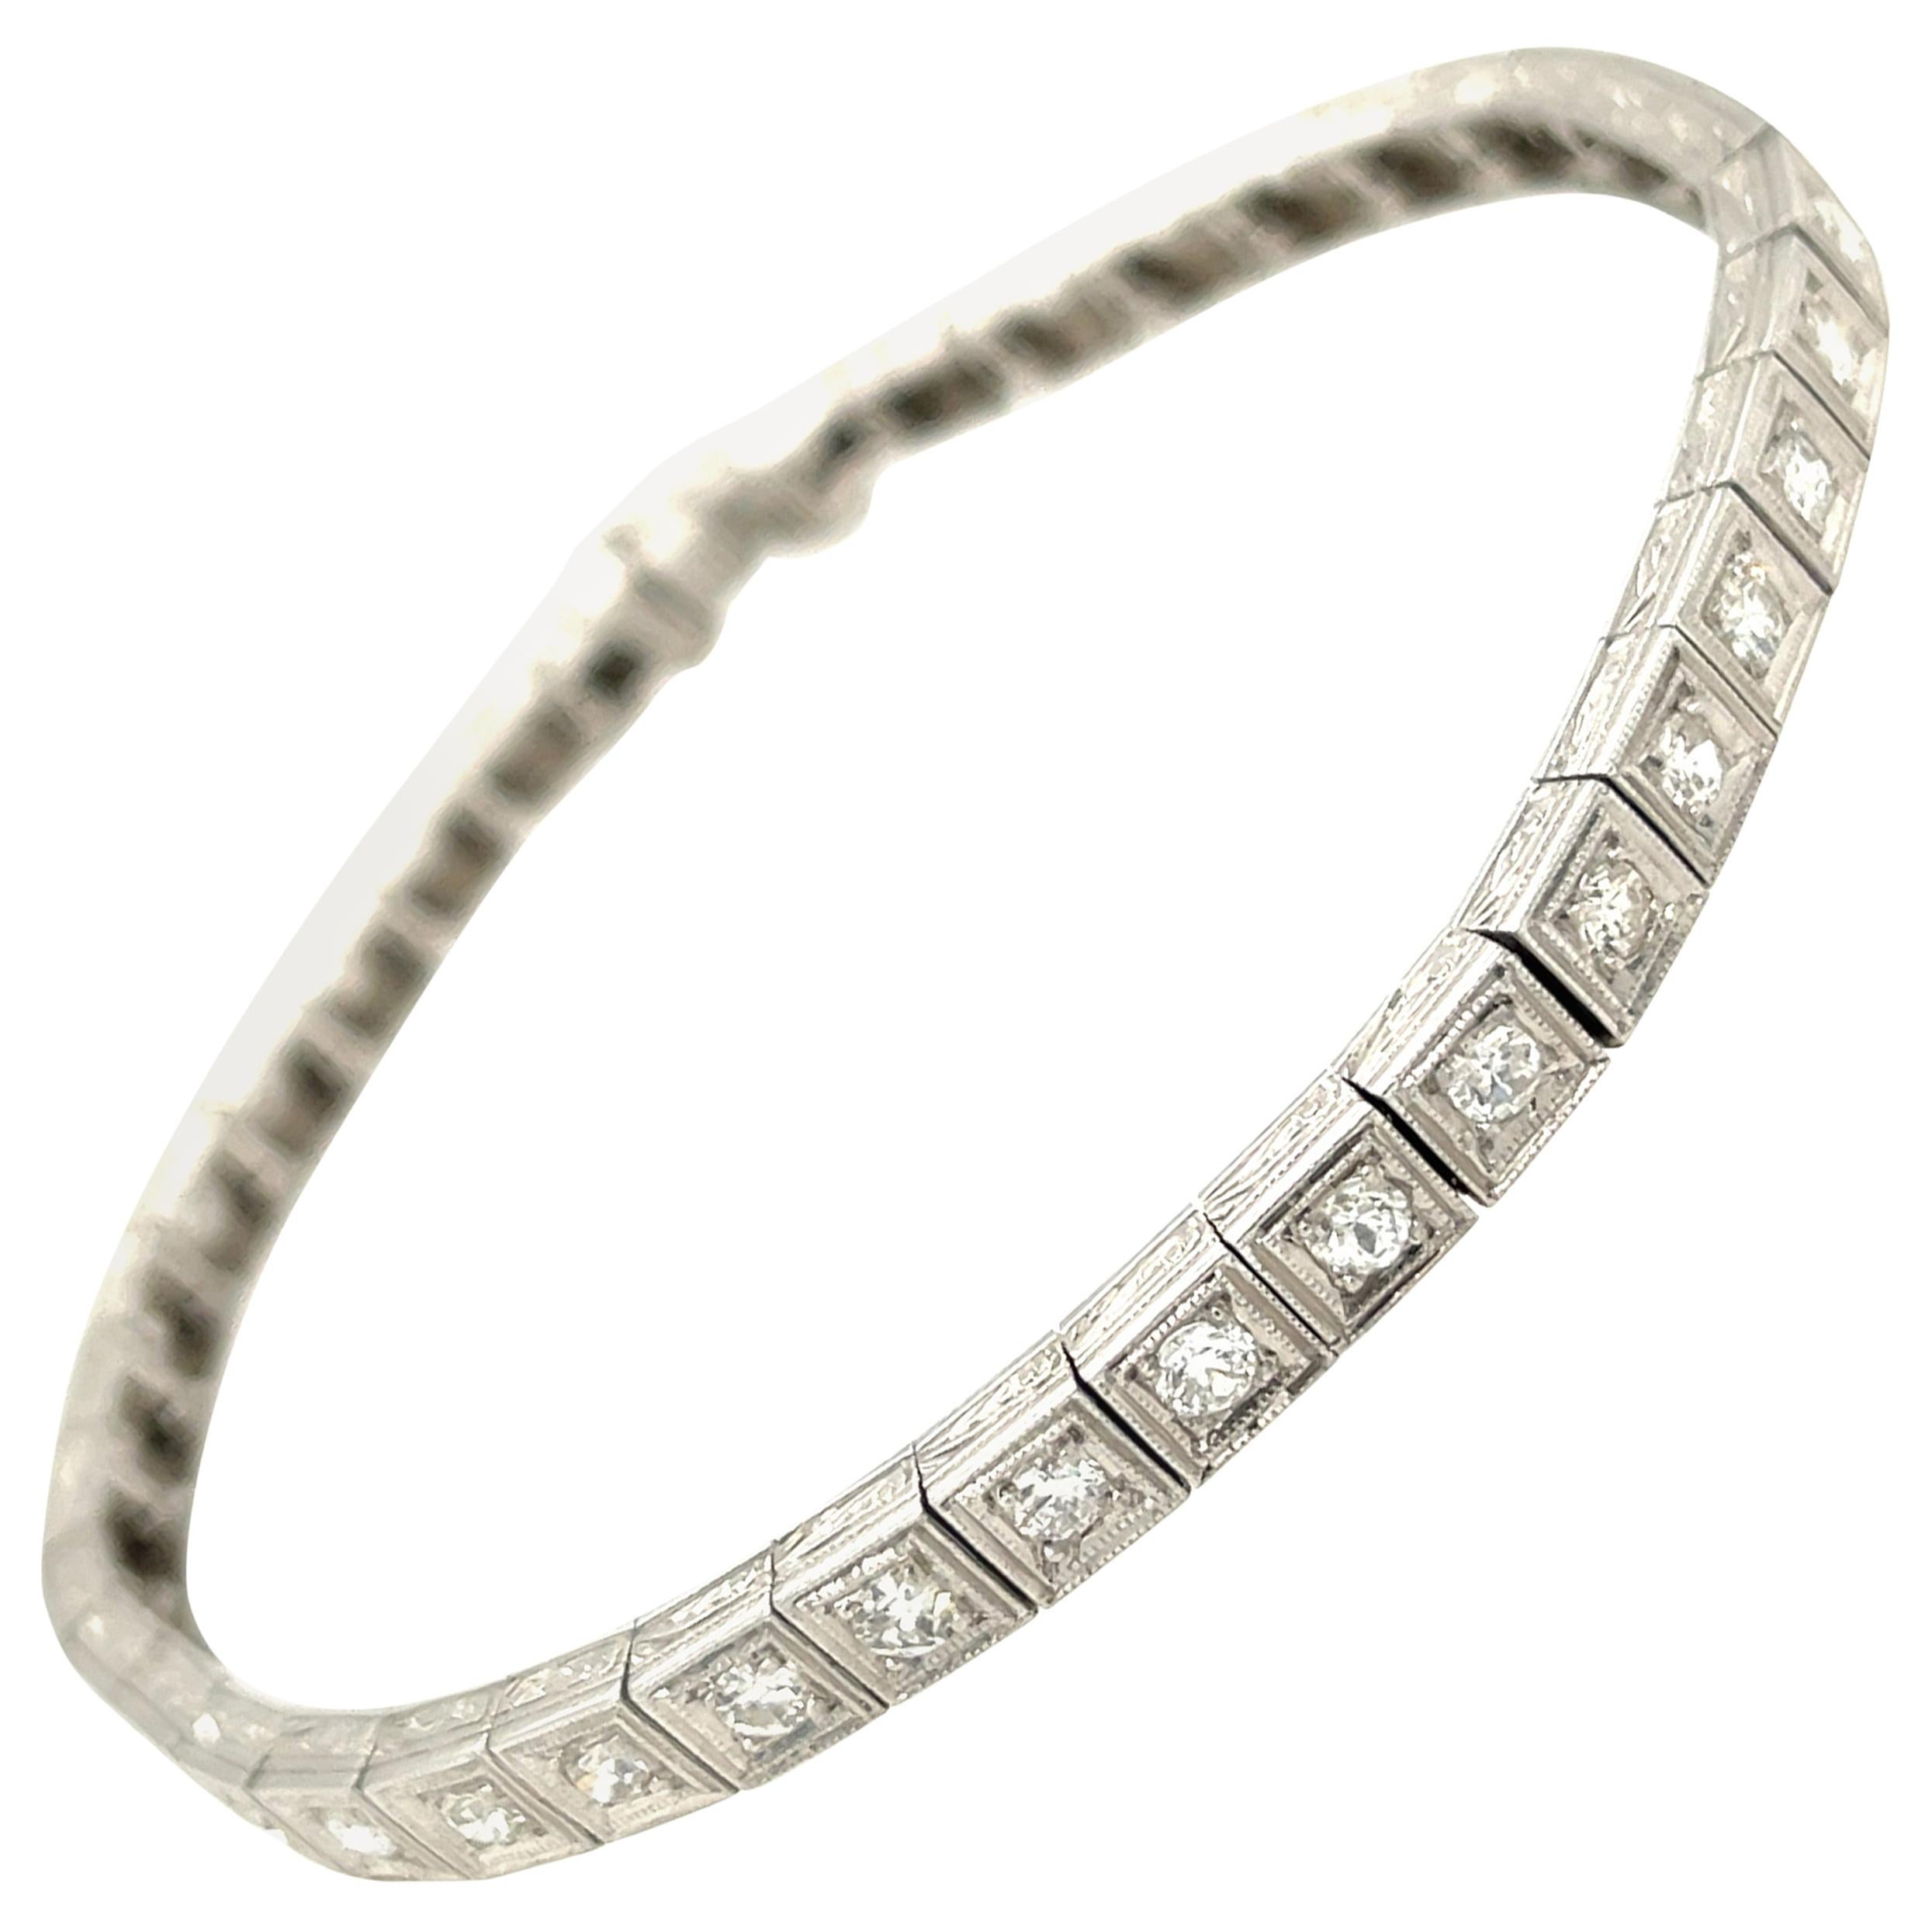 Antique Art Deco Platinum Diamond Line Bracelet